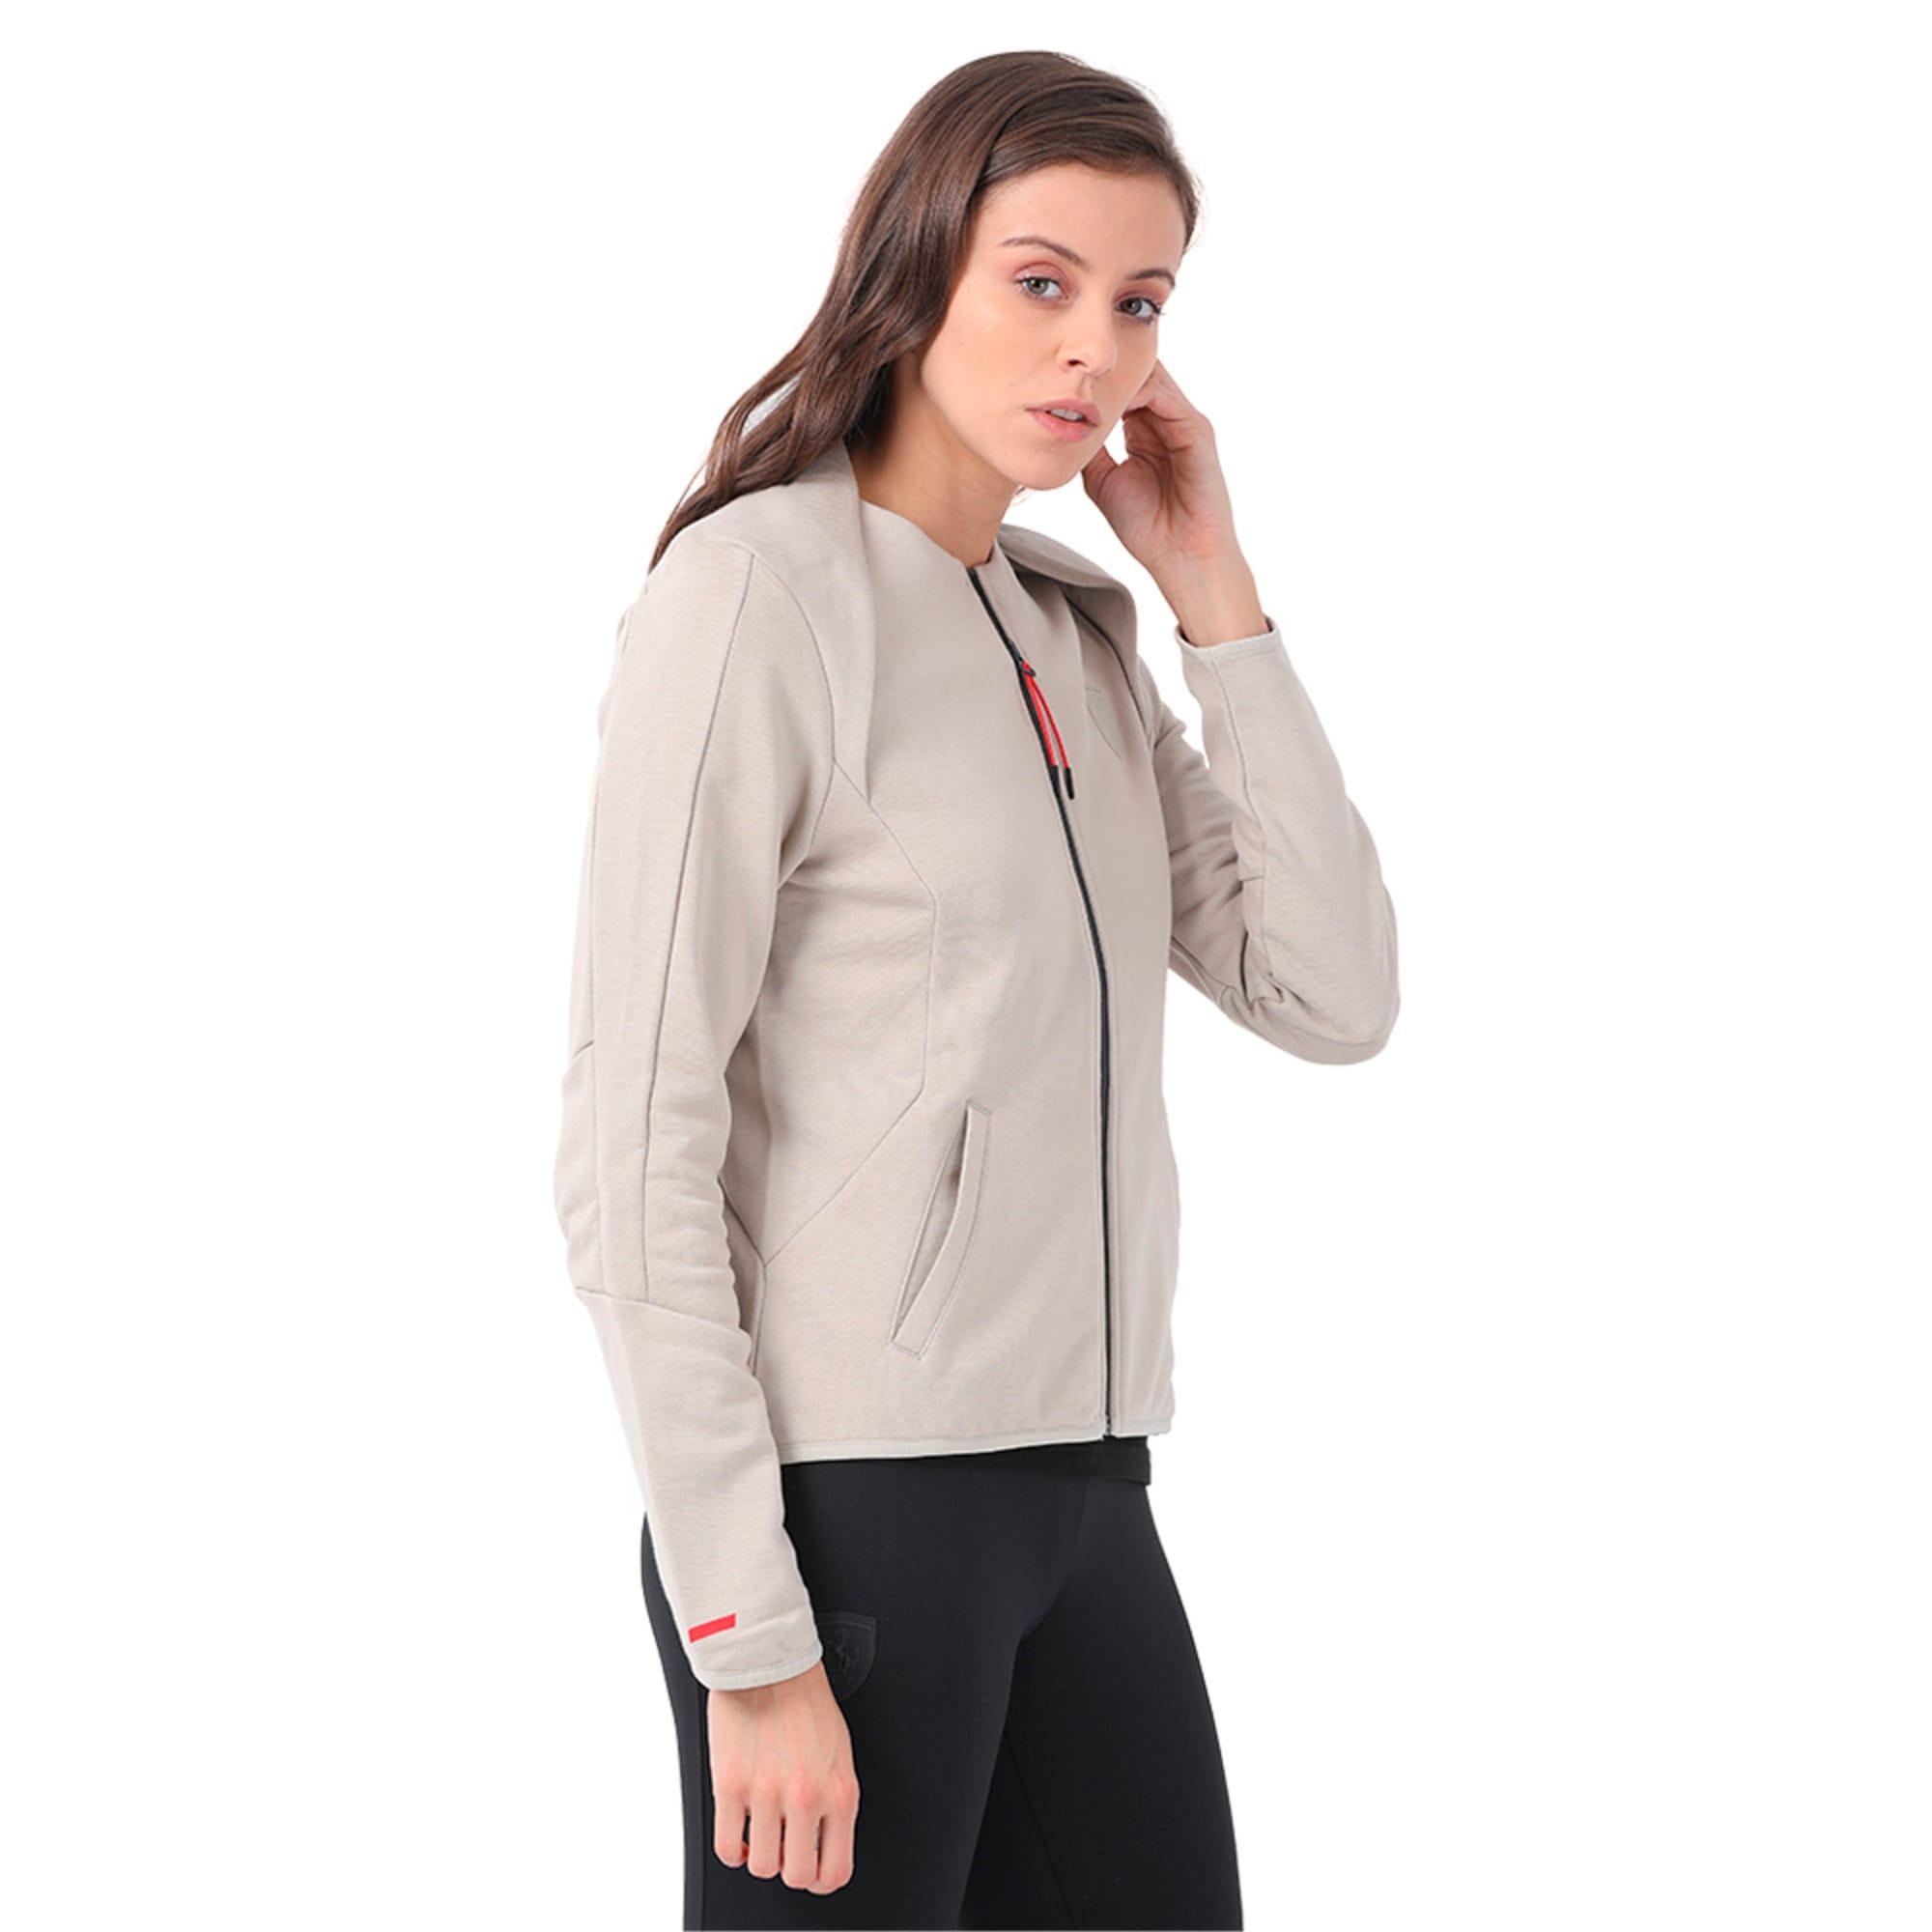 Thumbnail 1 of Ferrari Lifestyle Women's T7 Sweat Jacket, Pure Cashmere, medium-IND